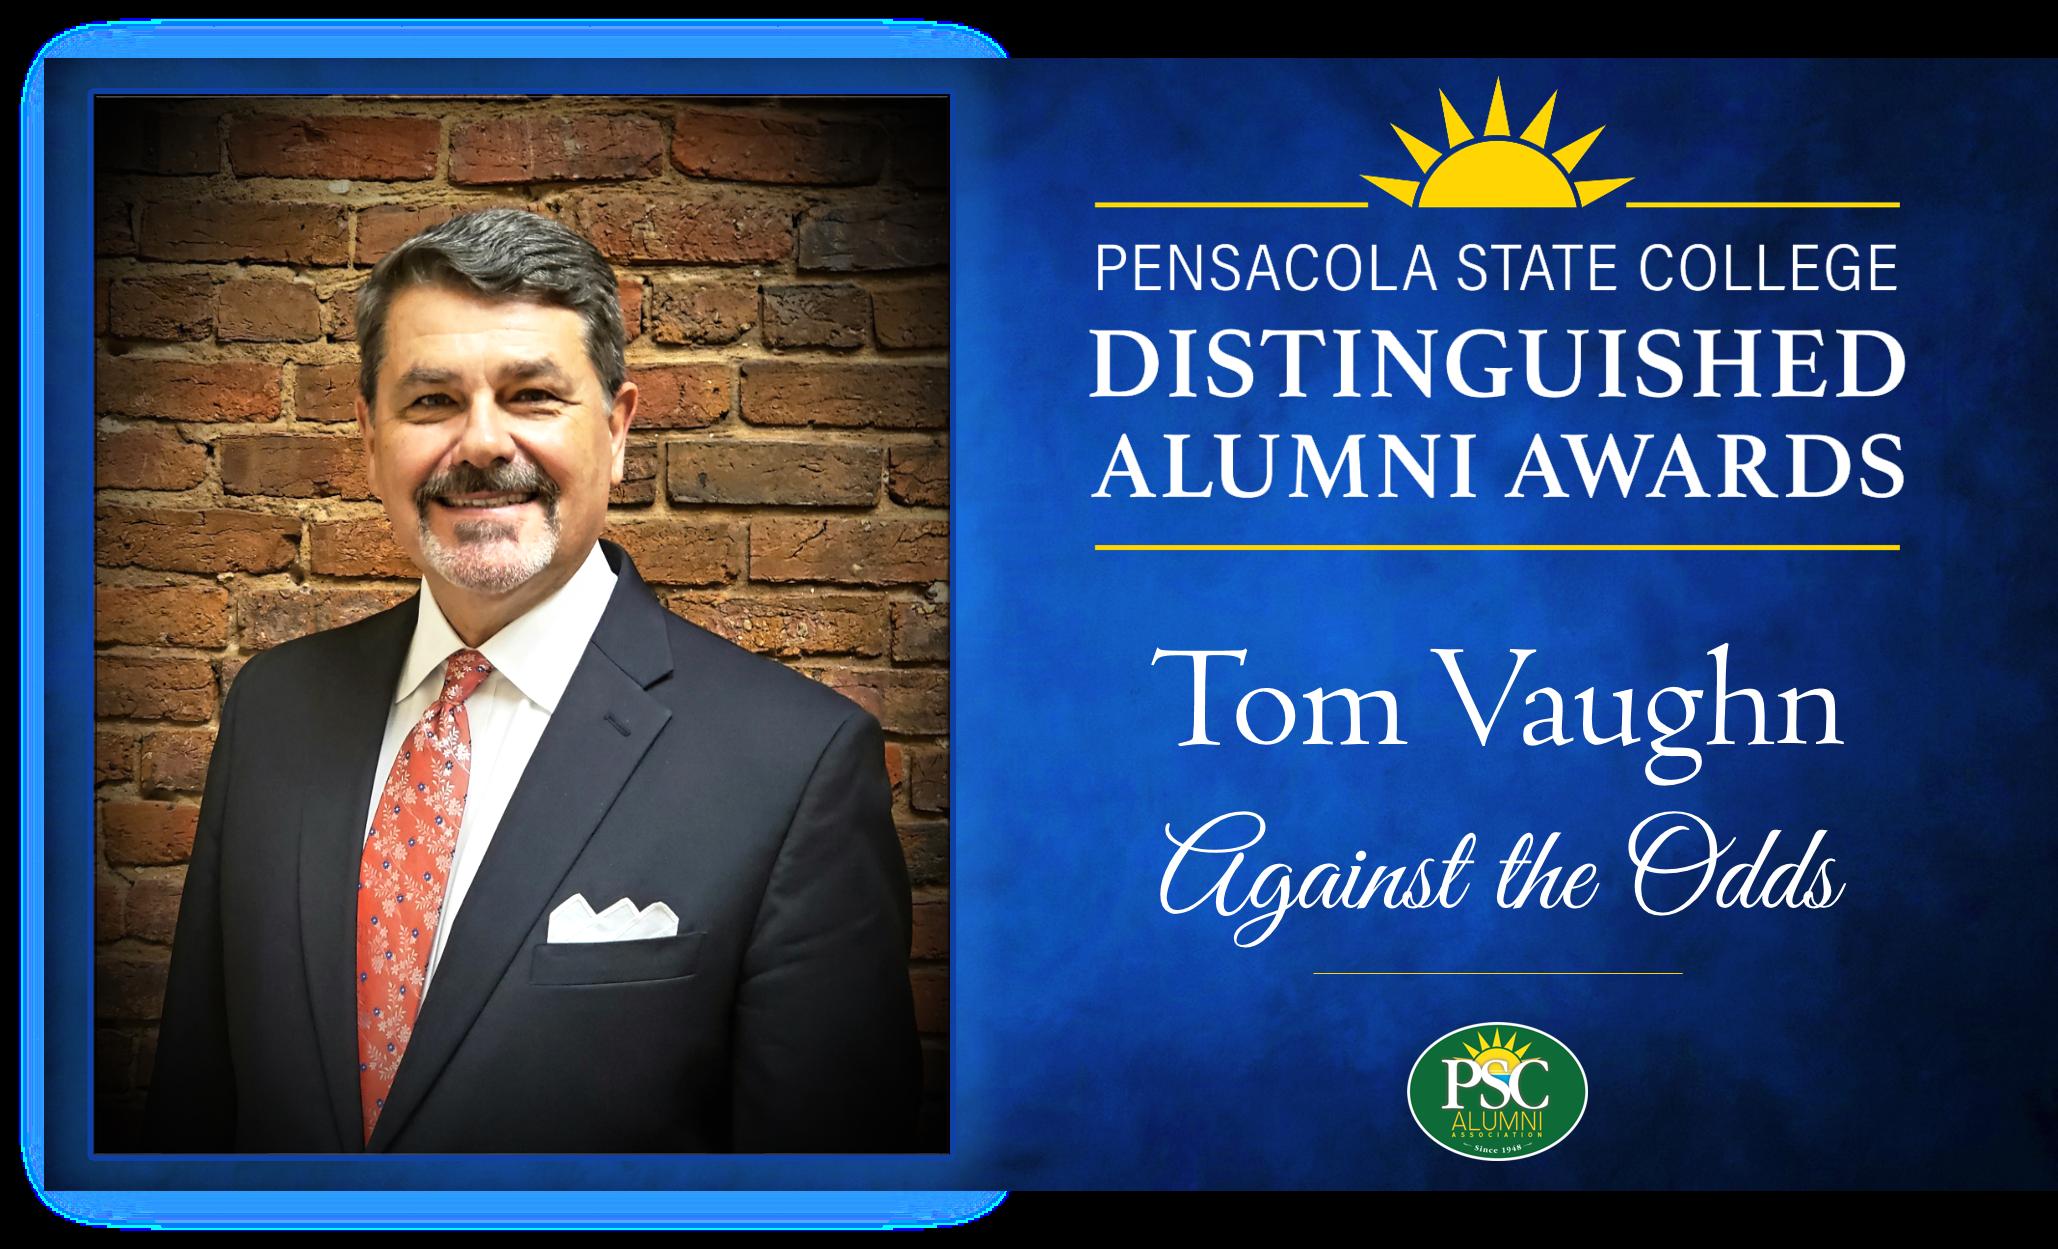 decorative image of vaughn , The 2019 Distinguished Alumni Awards 2019-05-06 10:15:44